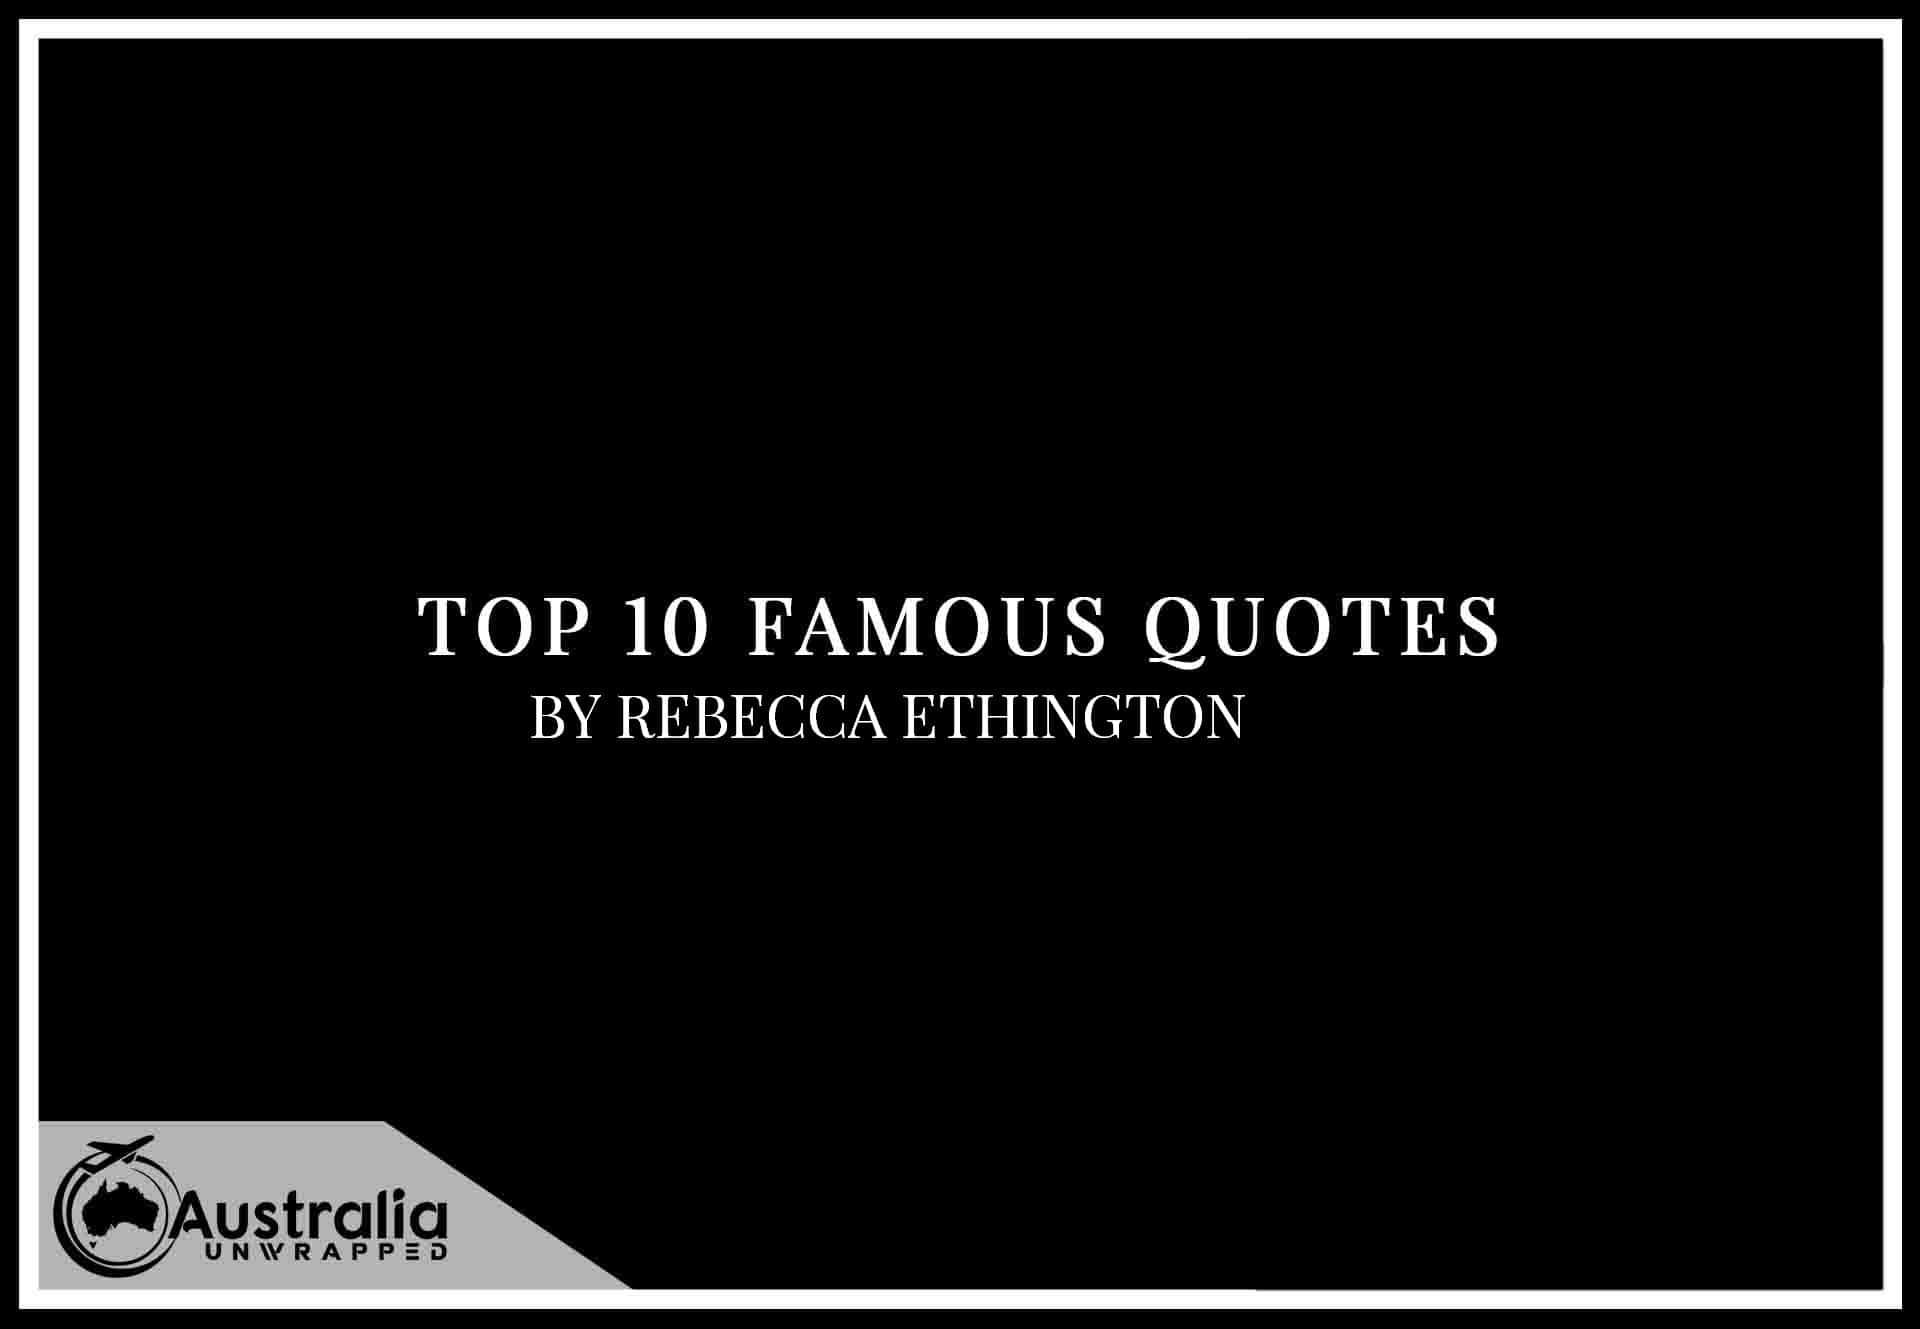 Top 10 Famous Quotes by Author Rebecca L. Ethington